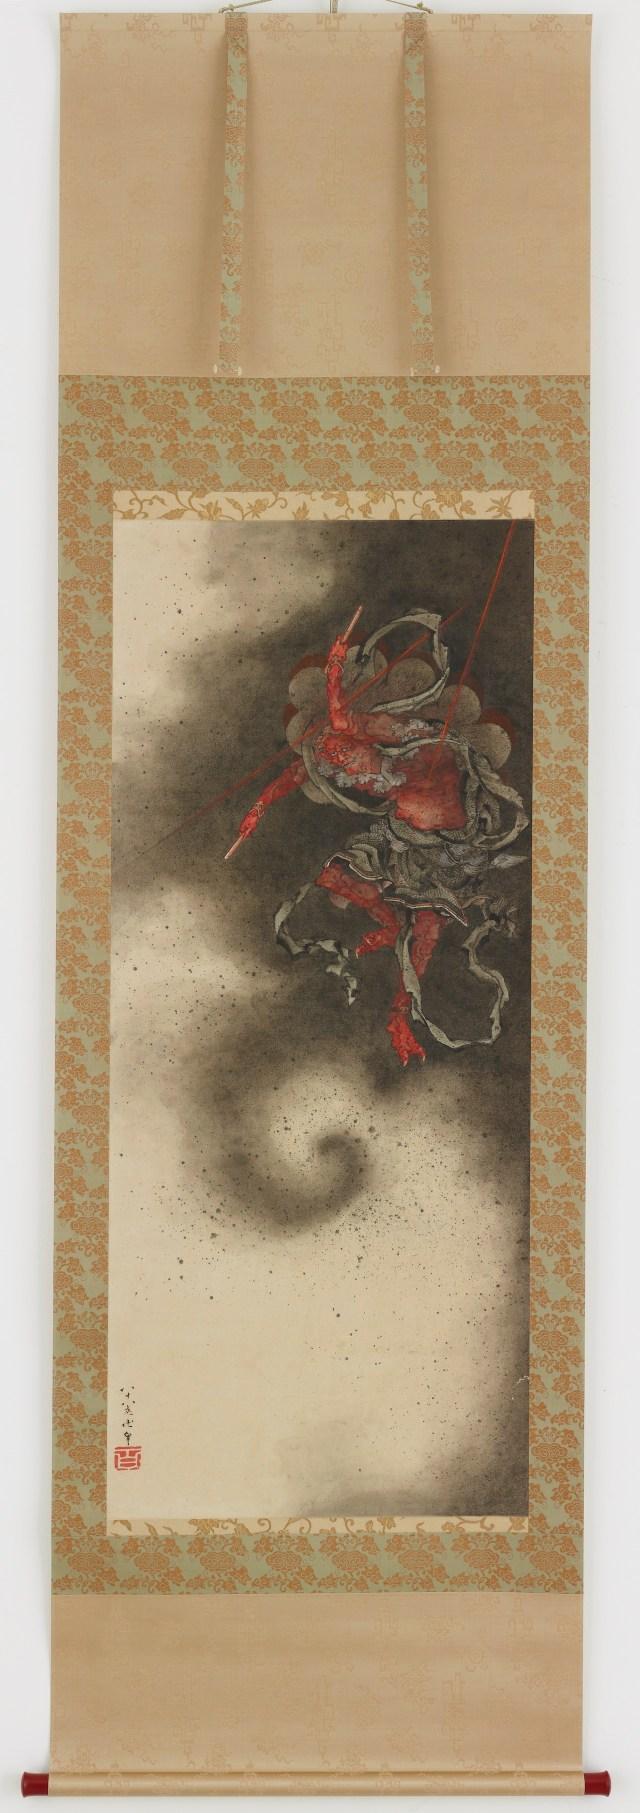 "Katsushika Hokusai, ""Thunder god"" (1760–1849), Japan, Edo period, 1847, ink and color on paper, Gift of Charles Lang Freer, Freer Gallery of Art"